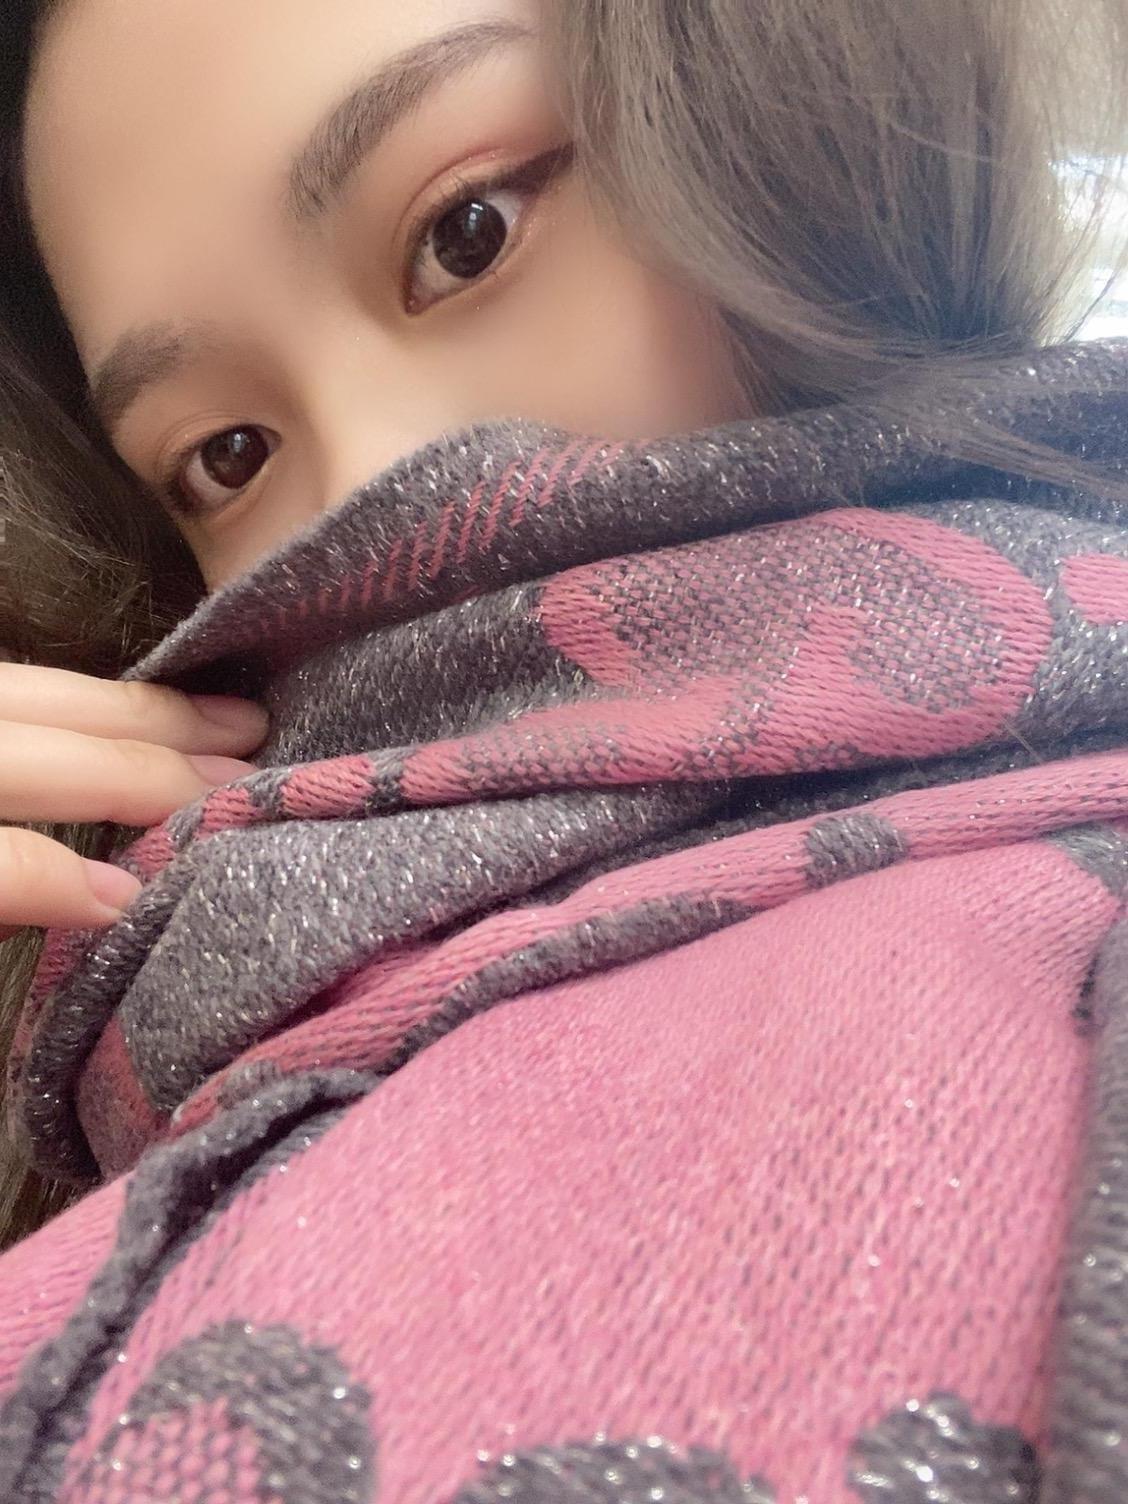 「No76 岡崎」11/25日(水) 14:57 | No76岡崎るかの写メ・風俗動画